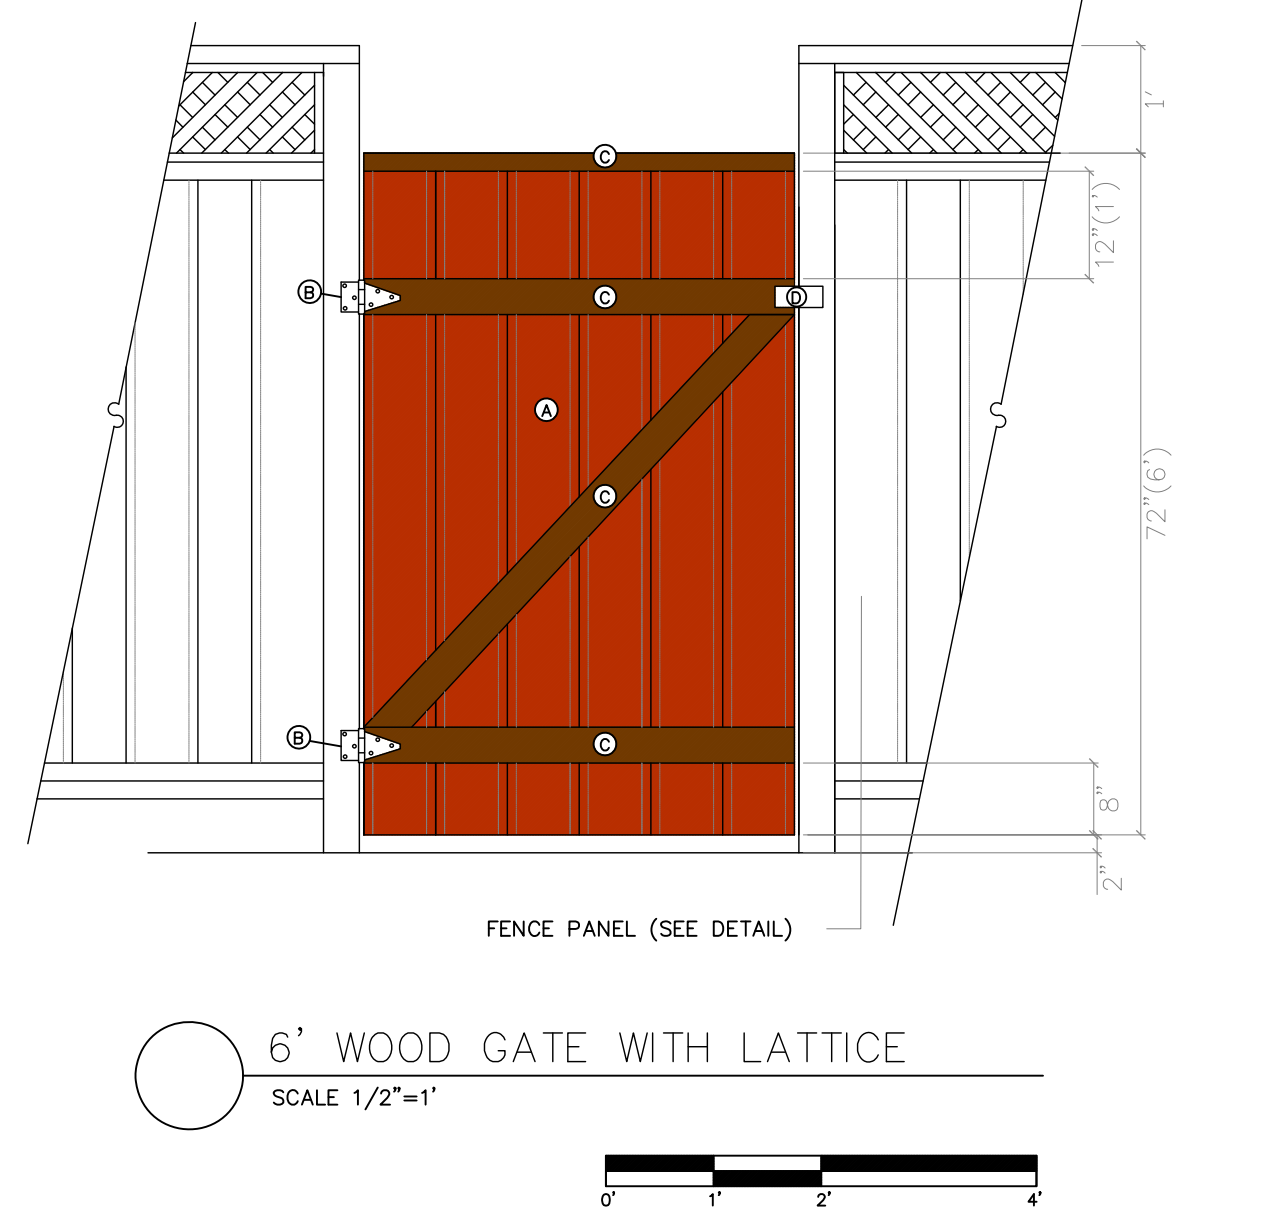 6' wood gate with lattice